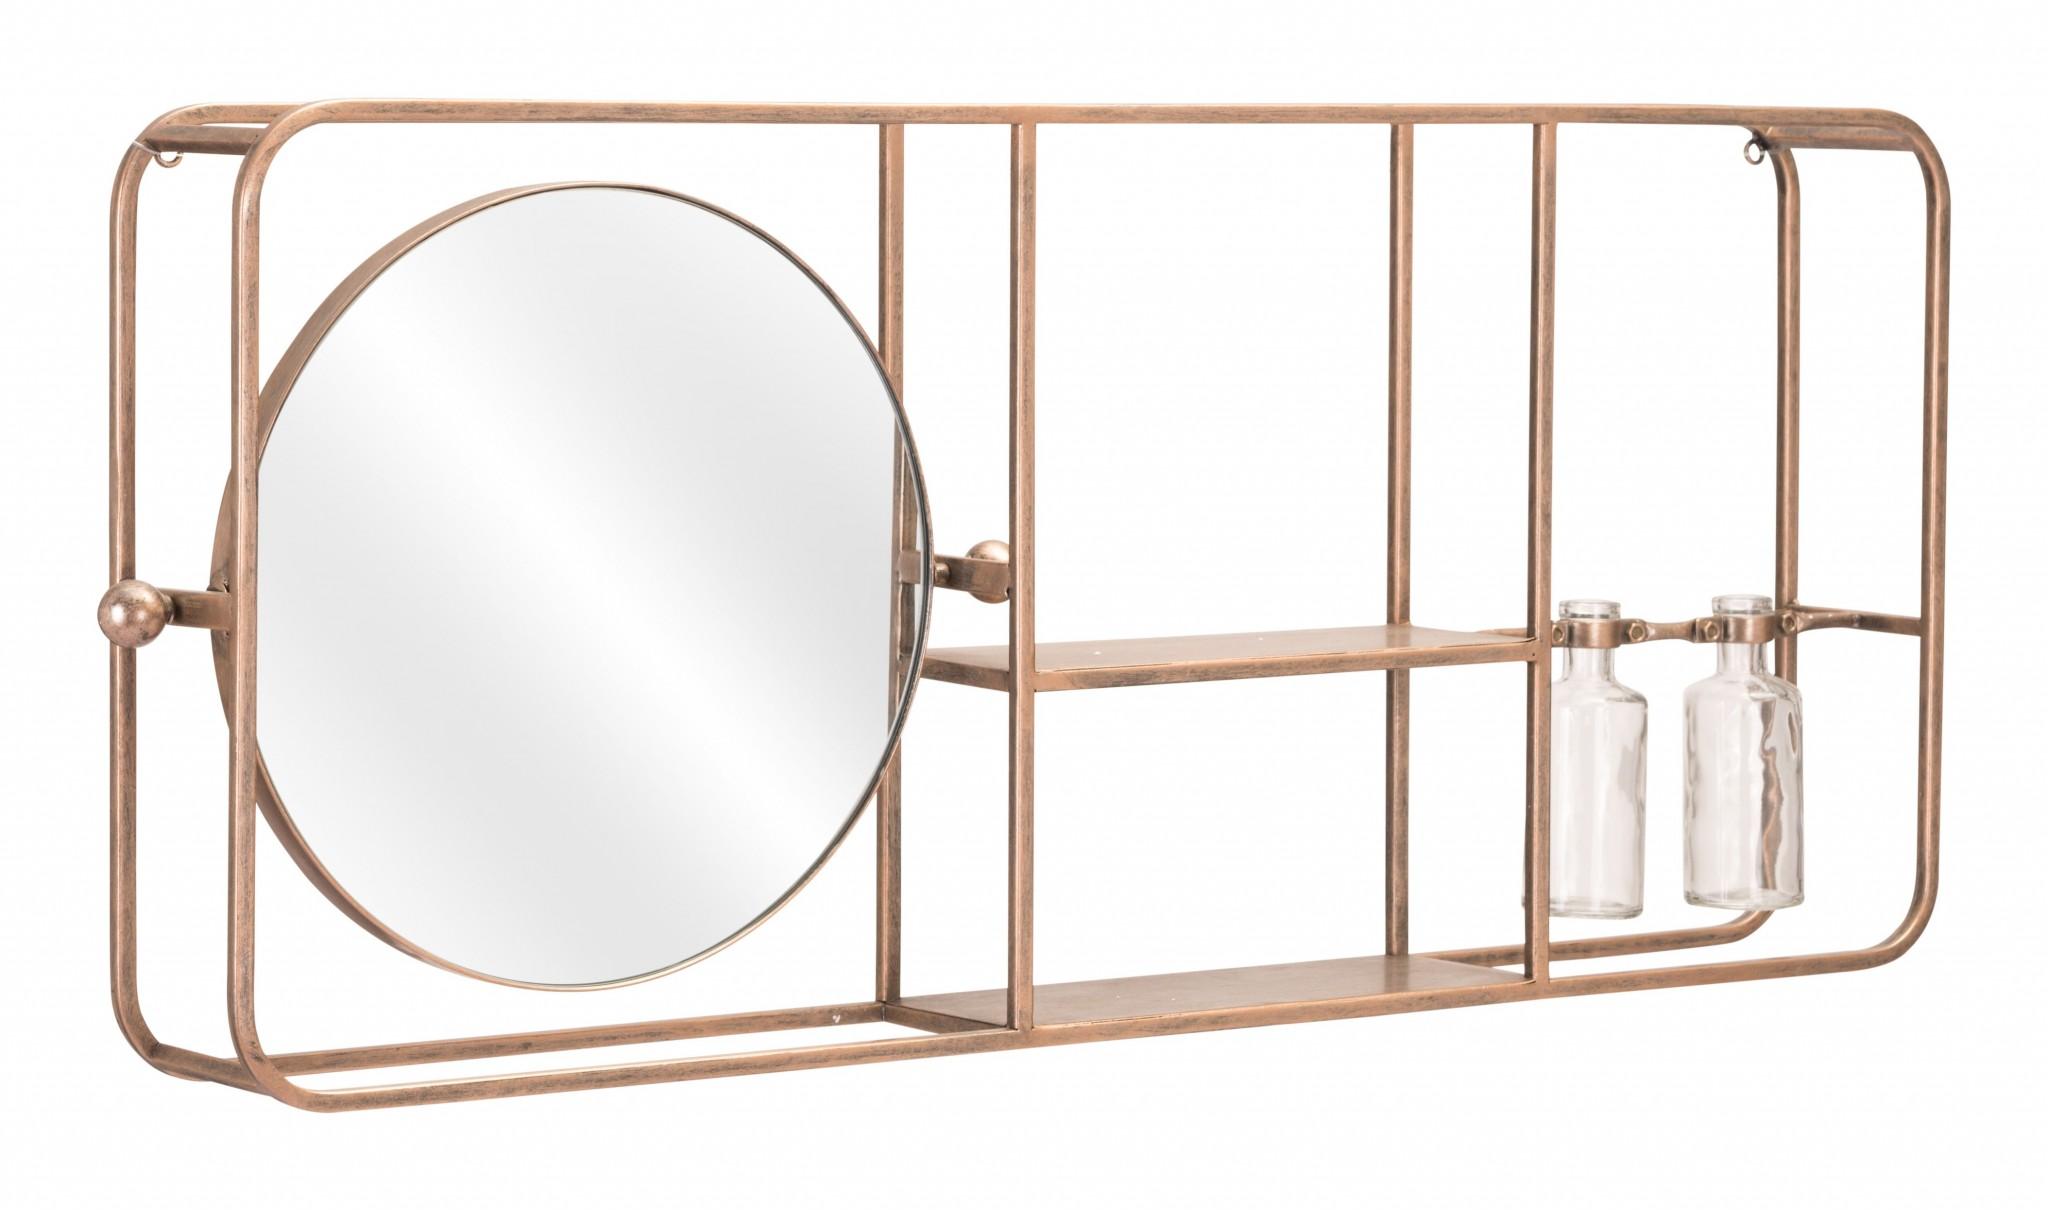 Gold Horizontal Shelf with Round Mirror